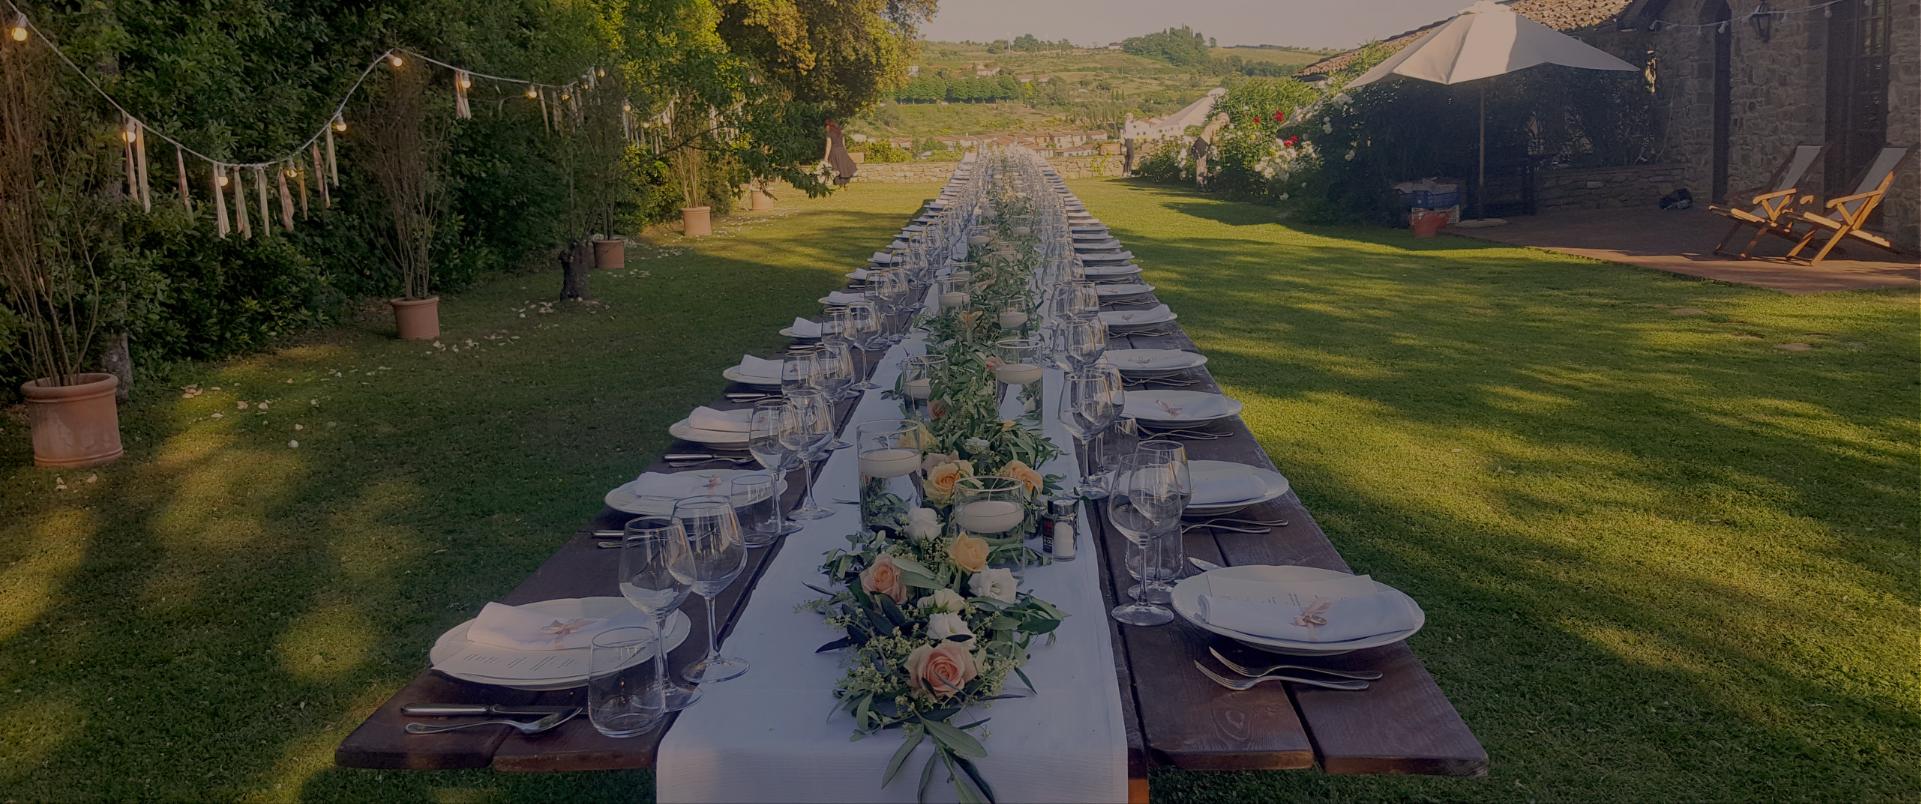 Nesti Noleggio Attrezzature Per Catering A Firenze Toscana